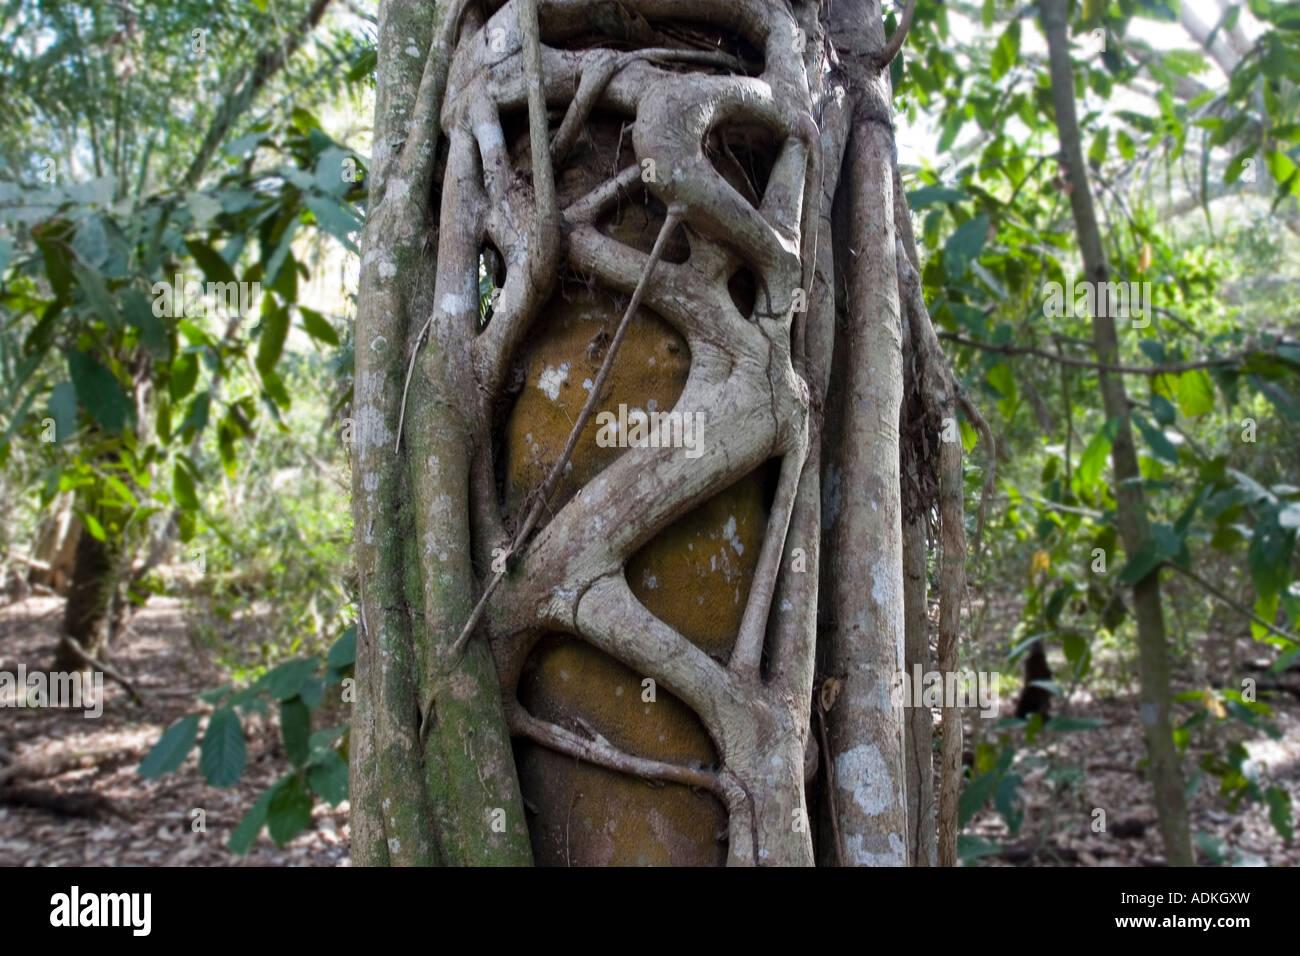 Strangle Fig Tree - Stock Image